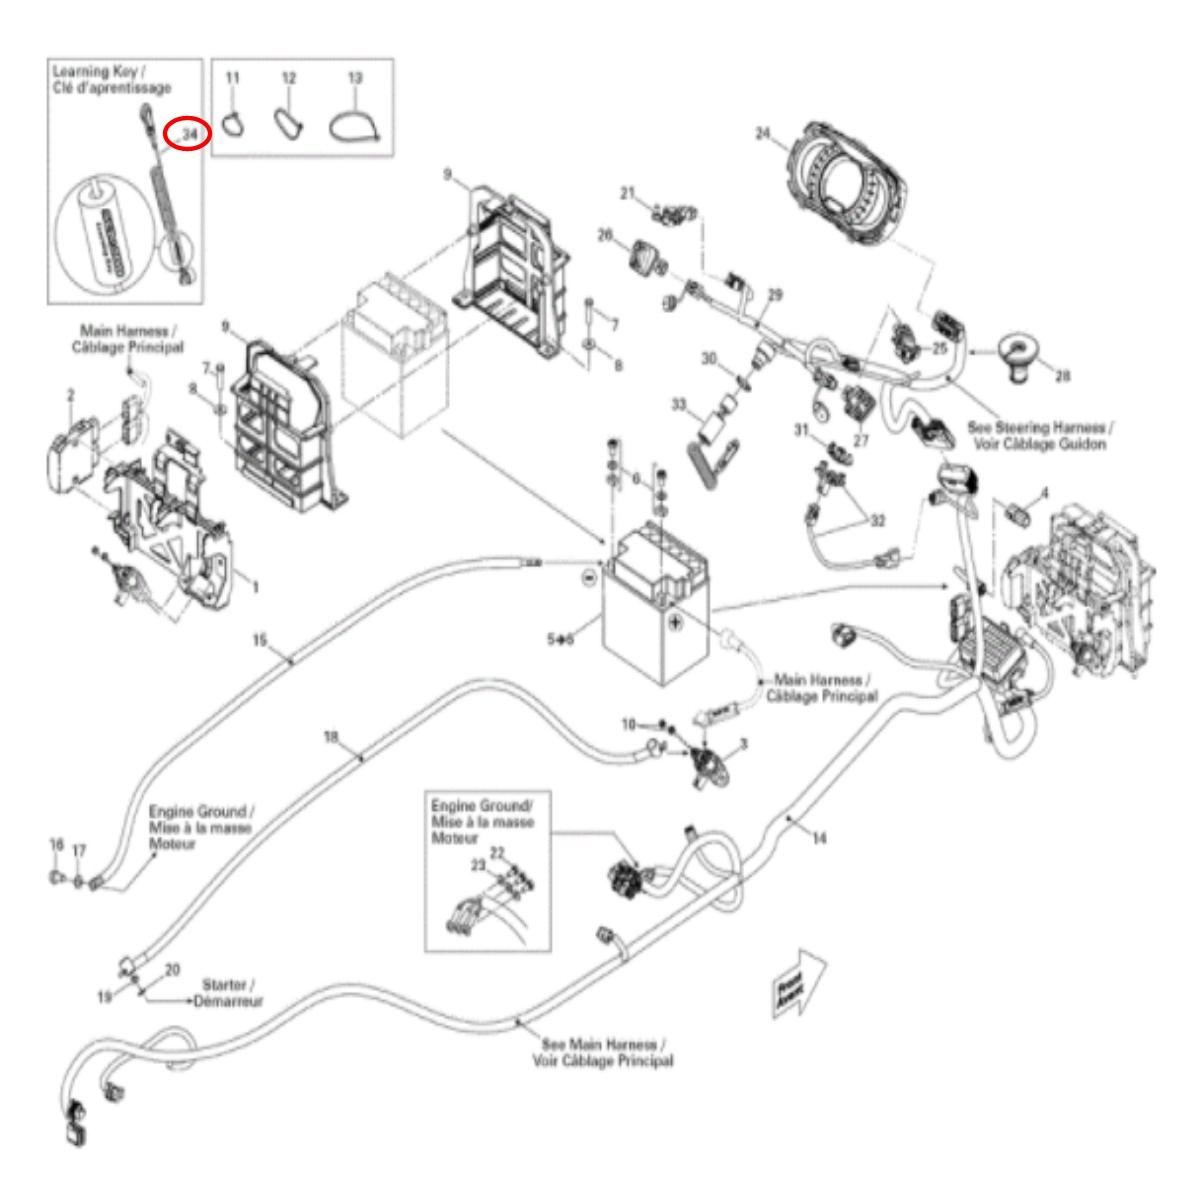 Chave Corta circuito Jet Ski SEADOO Original Codificado  - Radical Peças - Peças para Jet Ski